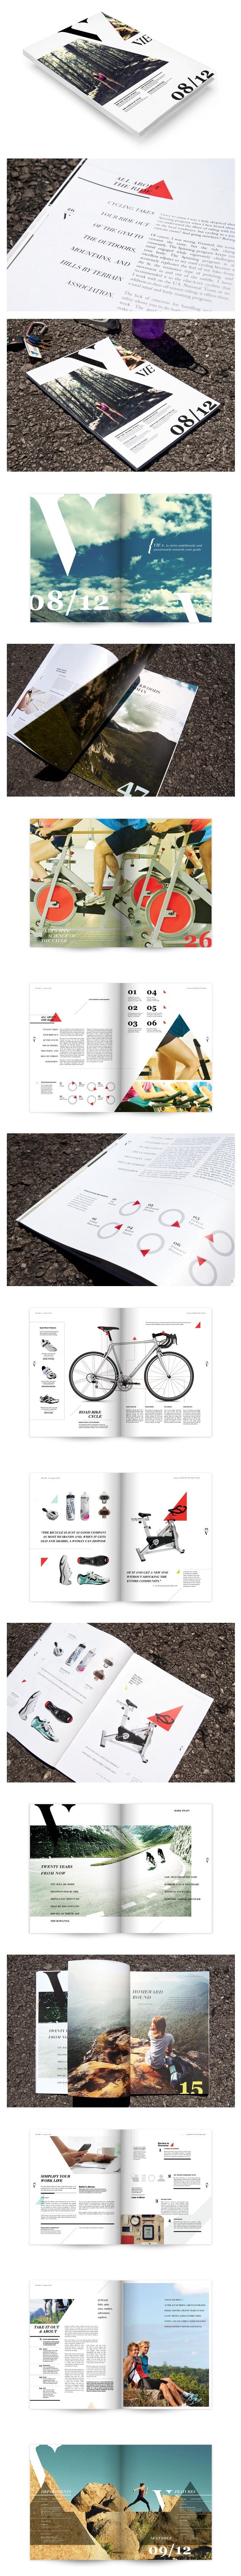 Vie Magazine triangle editorial layout design based on the bike shape